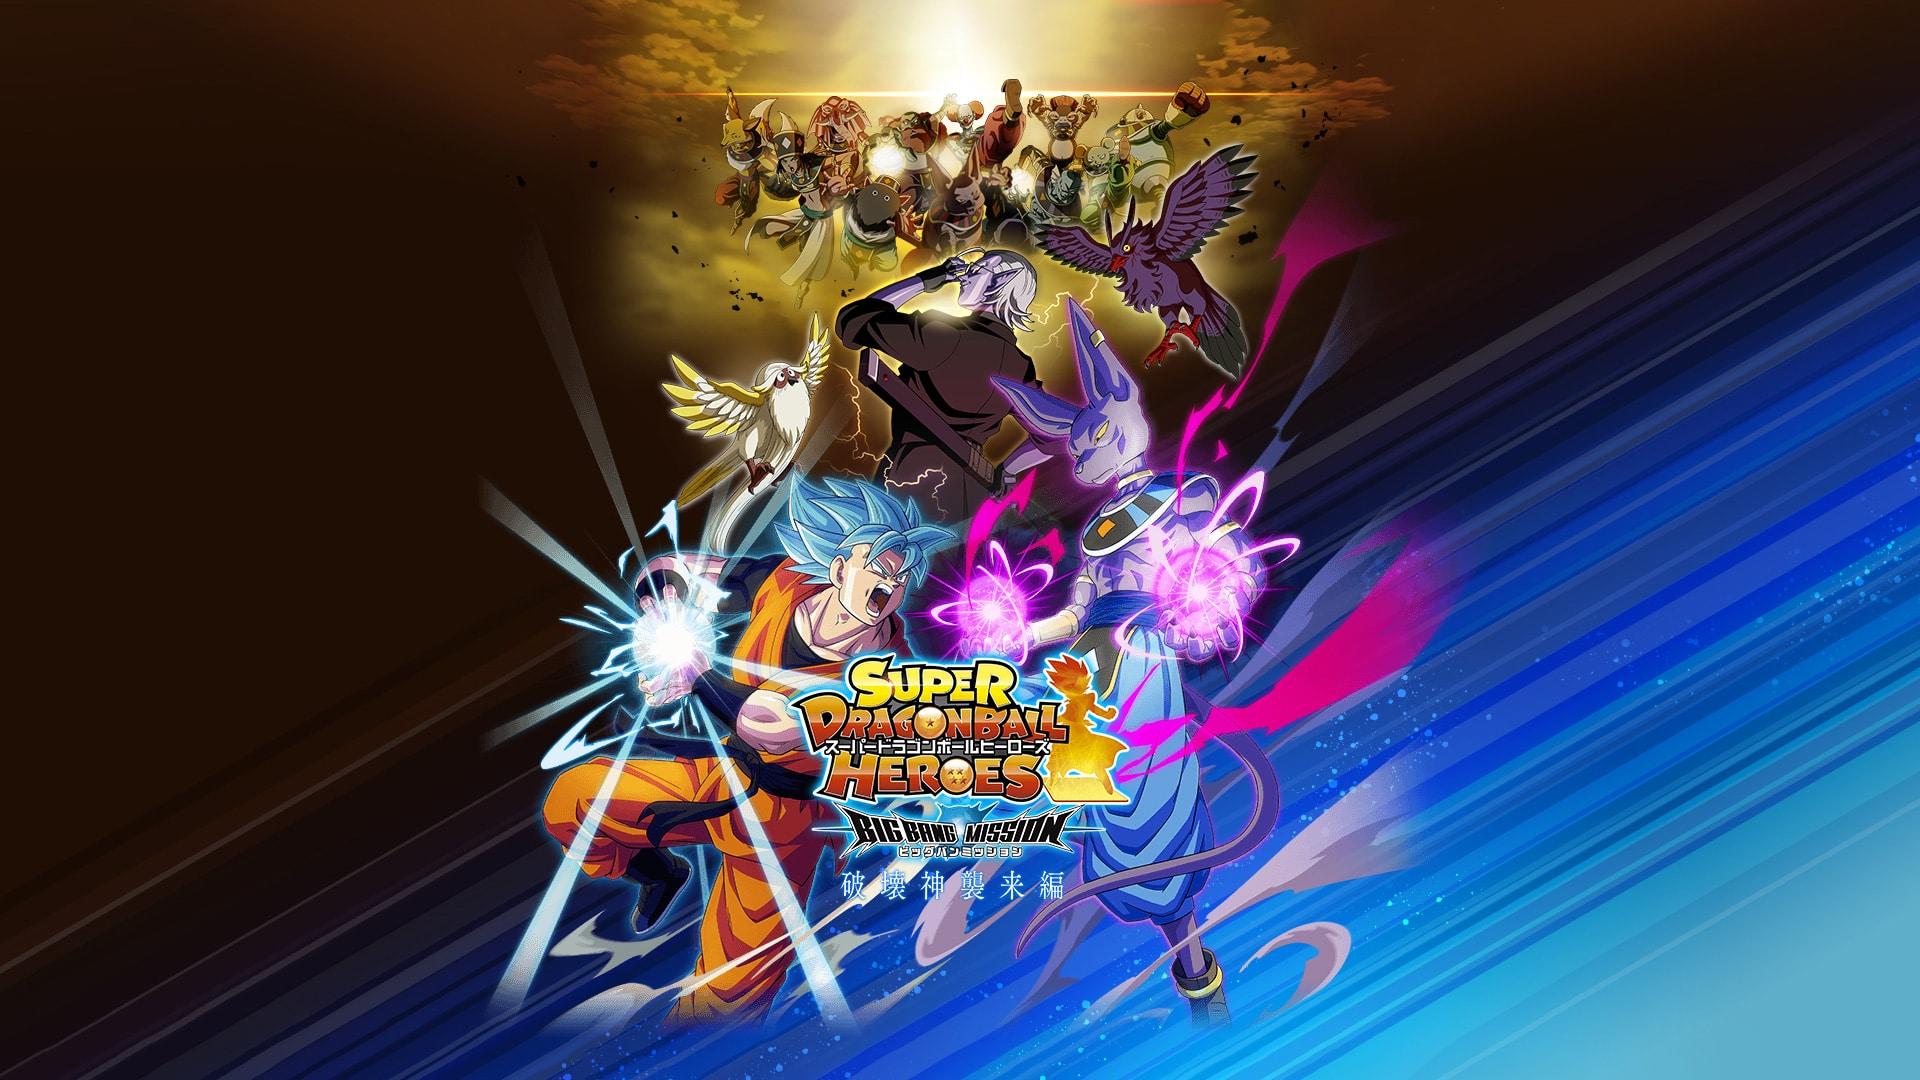 bigbangmissionbanner - Super Dragon Ball Heroes